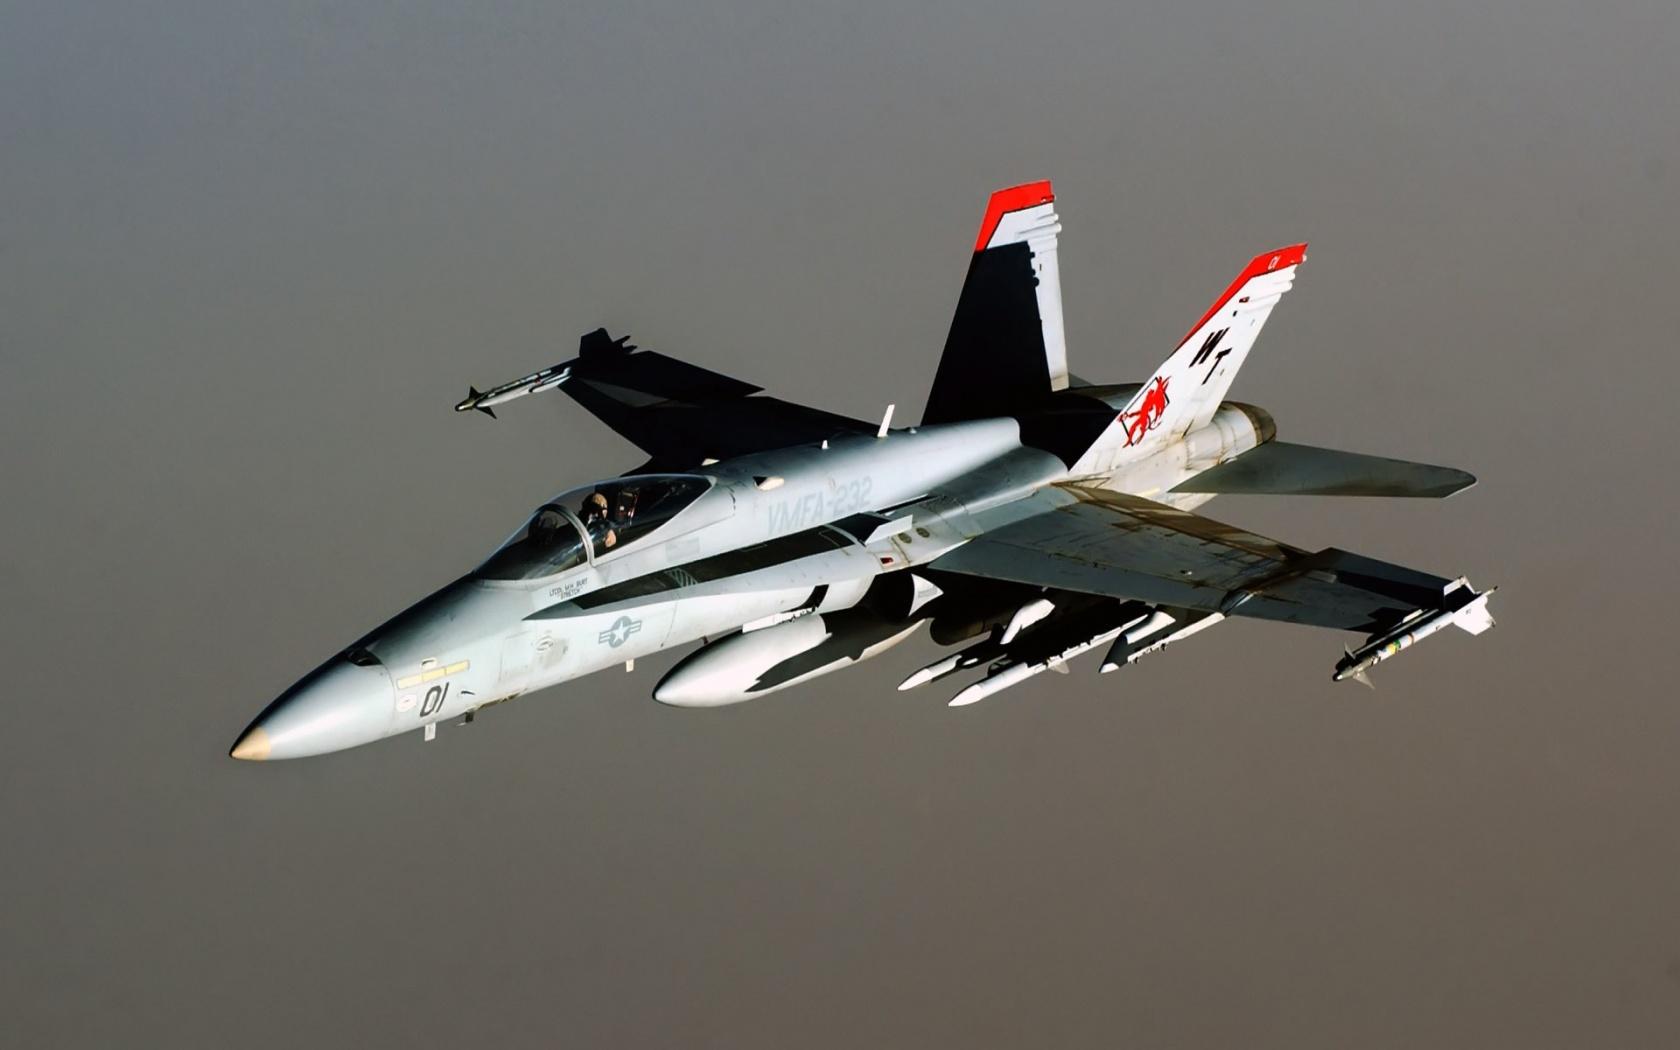 fa 18 hornet aircraft 1680 x 1050